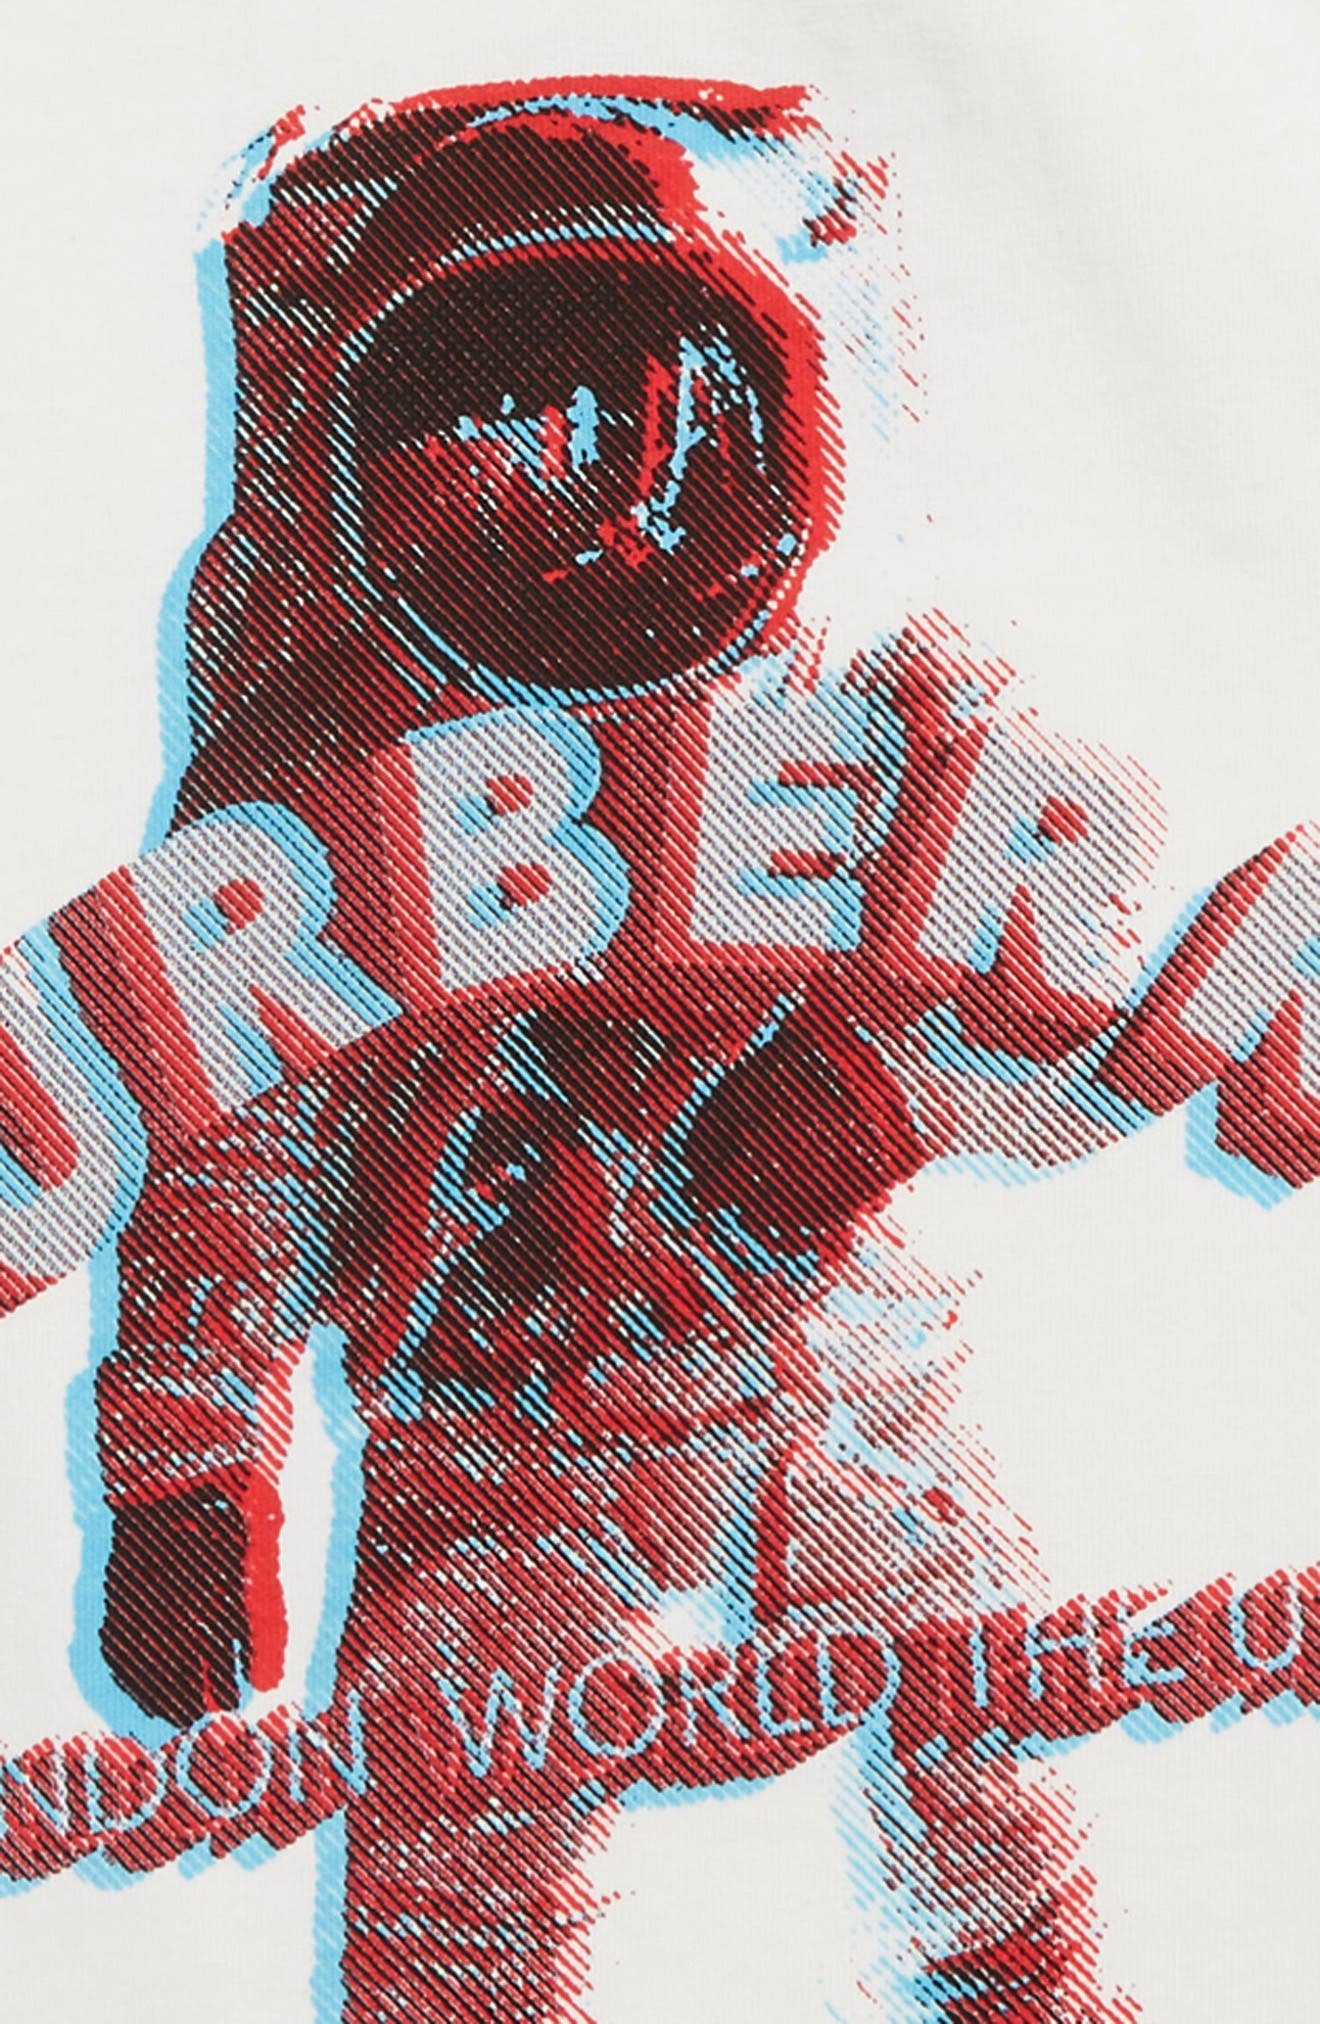 BURBERRY,                             3D Spaceman Graphic T-Shirt,                             Alternate thumbnail 3, color,                             100